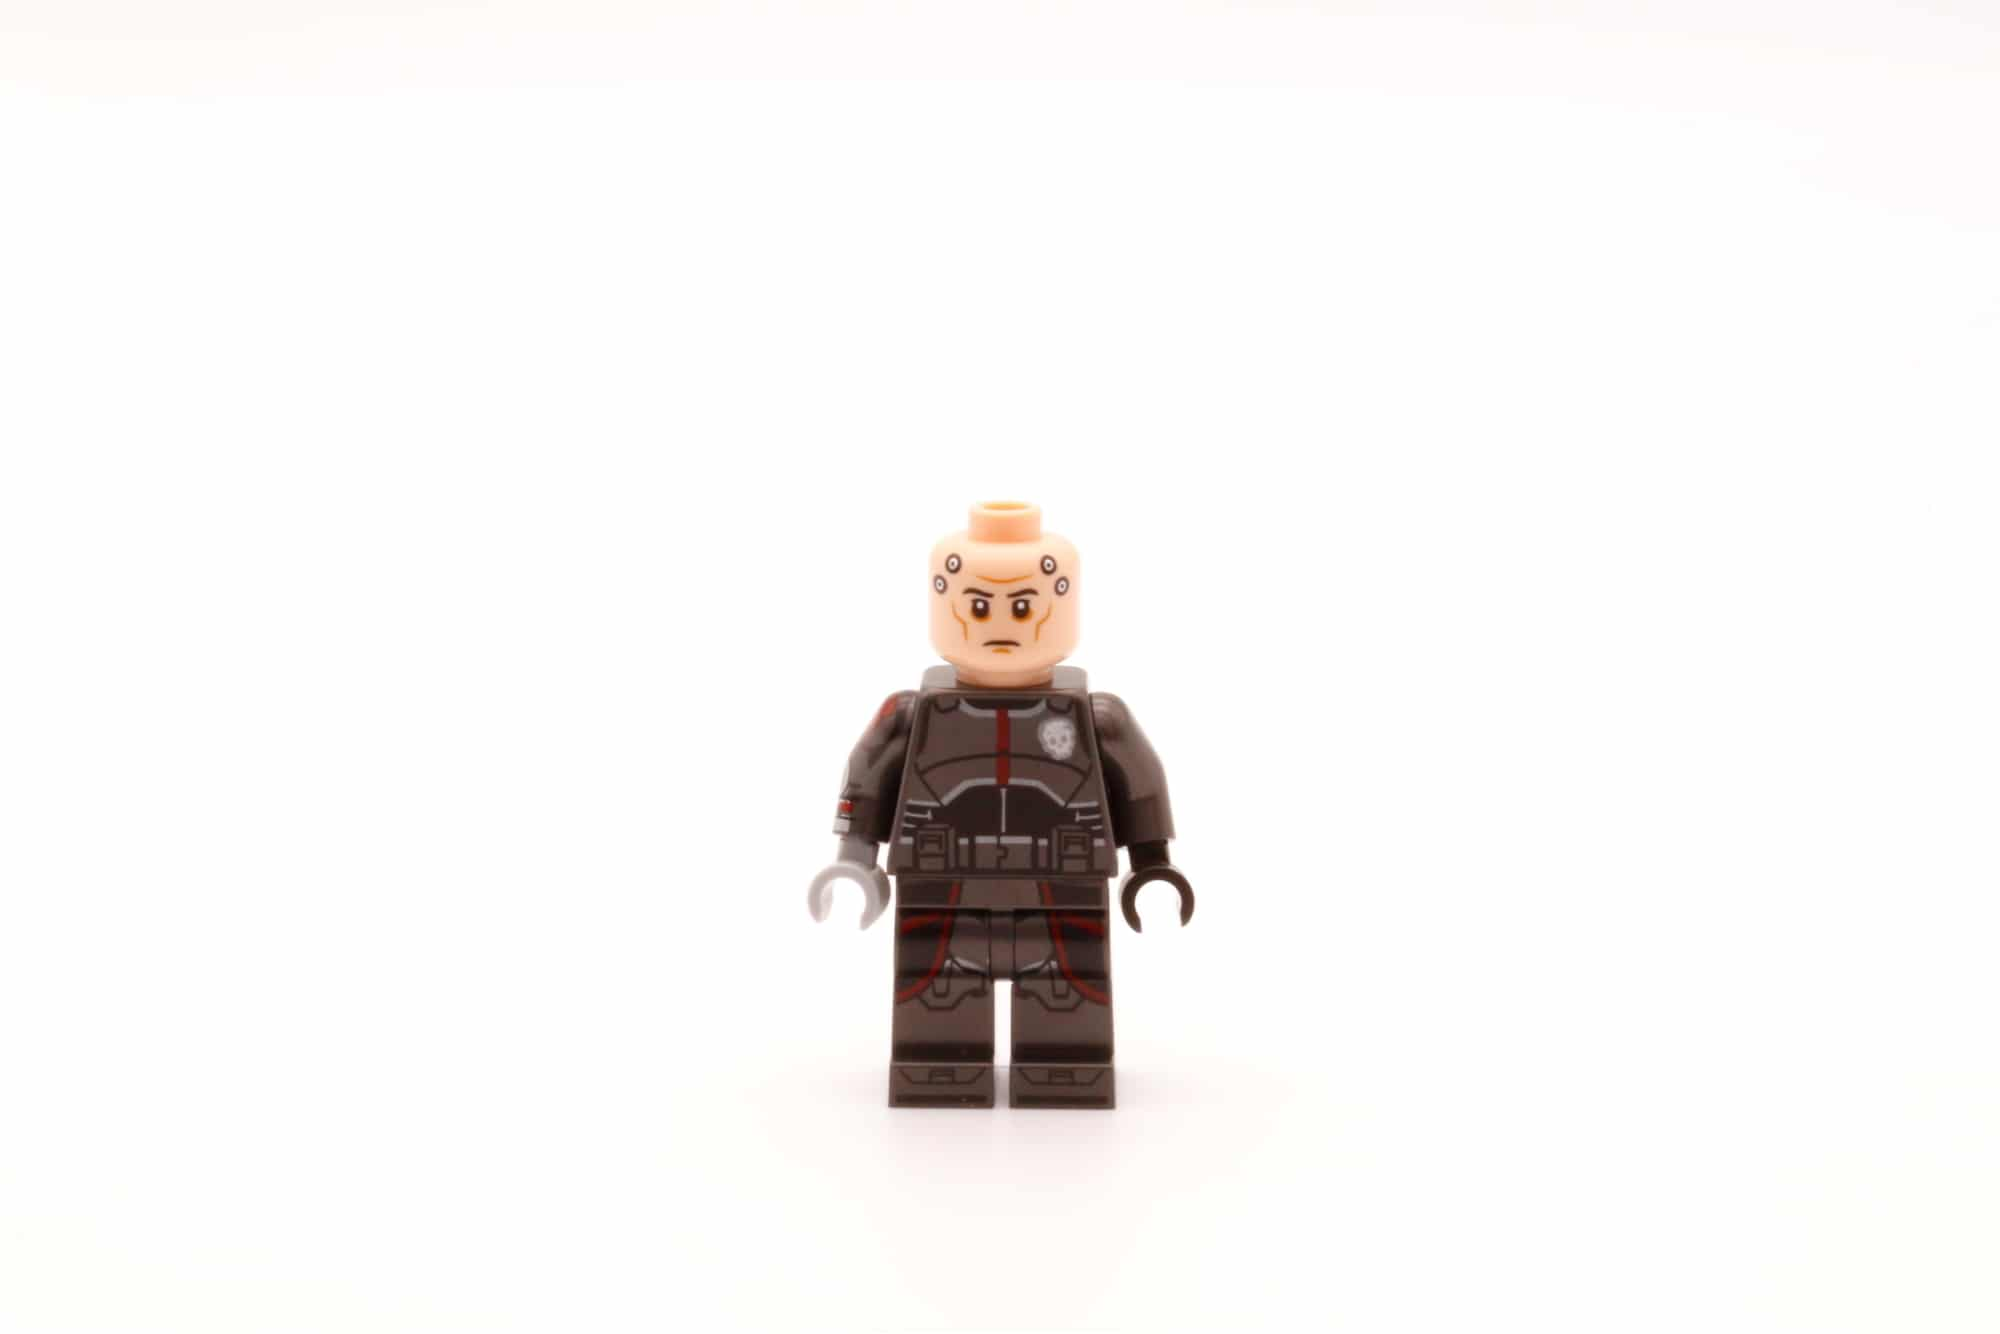 LEGO Star Wars 75314 The Bad Batch Attack Shuttle Echo ohne Helm